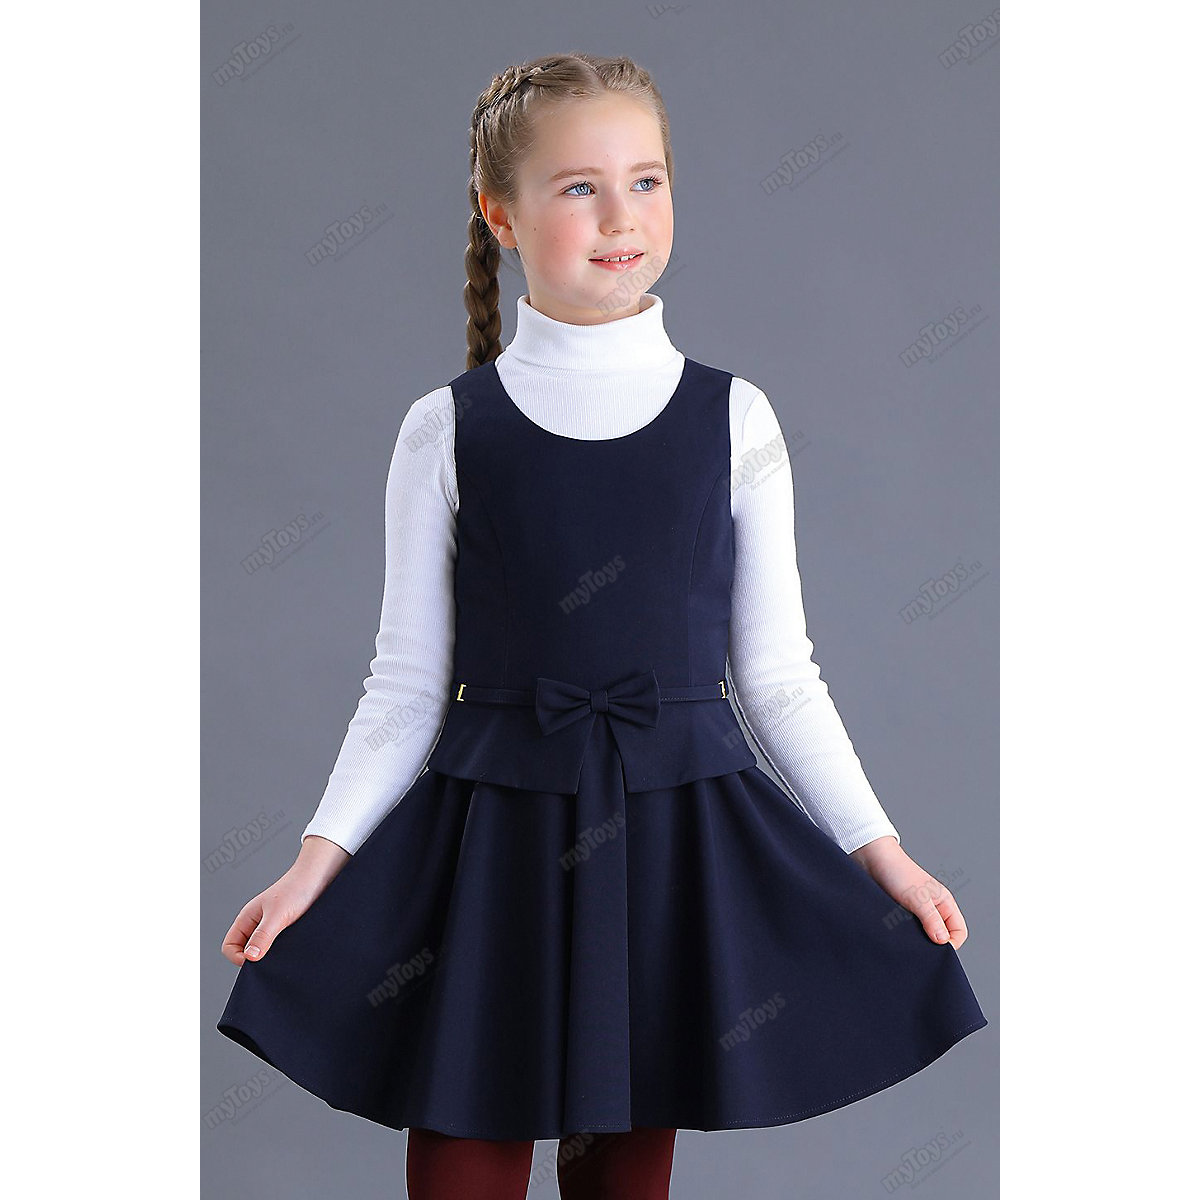 МАЛЕНЬКАЯ ЛЕДИ Dresses 11685478 school uniform dark blue for girls Formal Sleeveless Bow black sexy lace up design plain halter sleeveless crop top